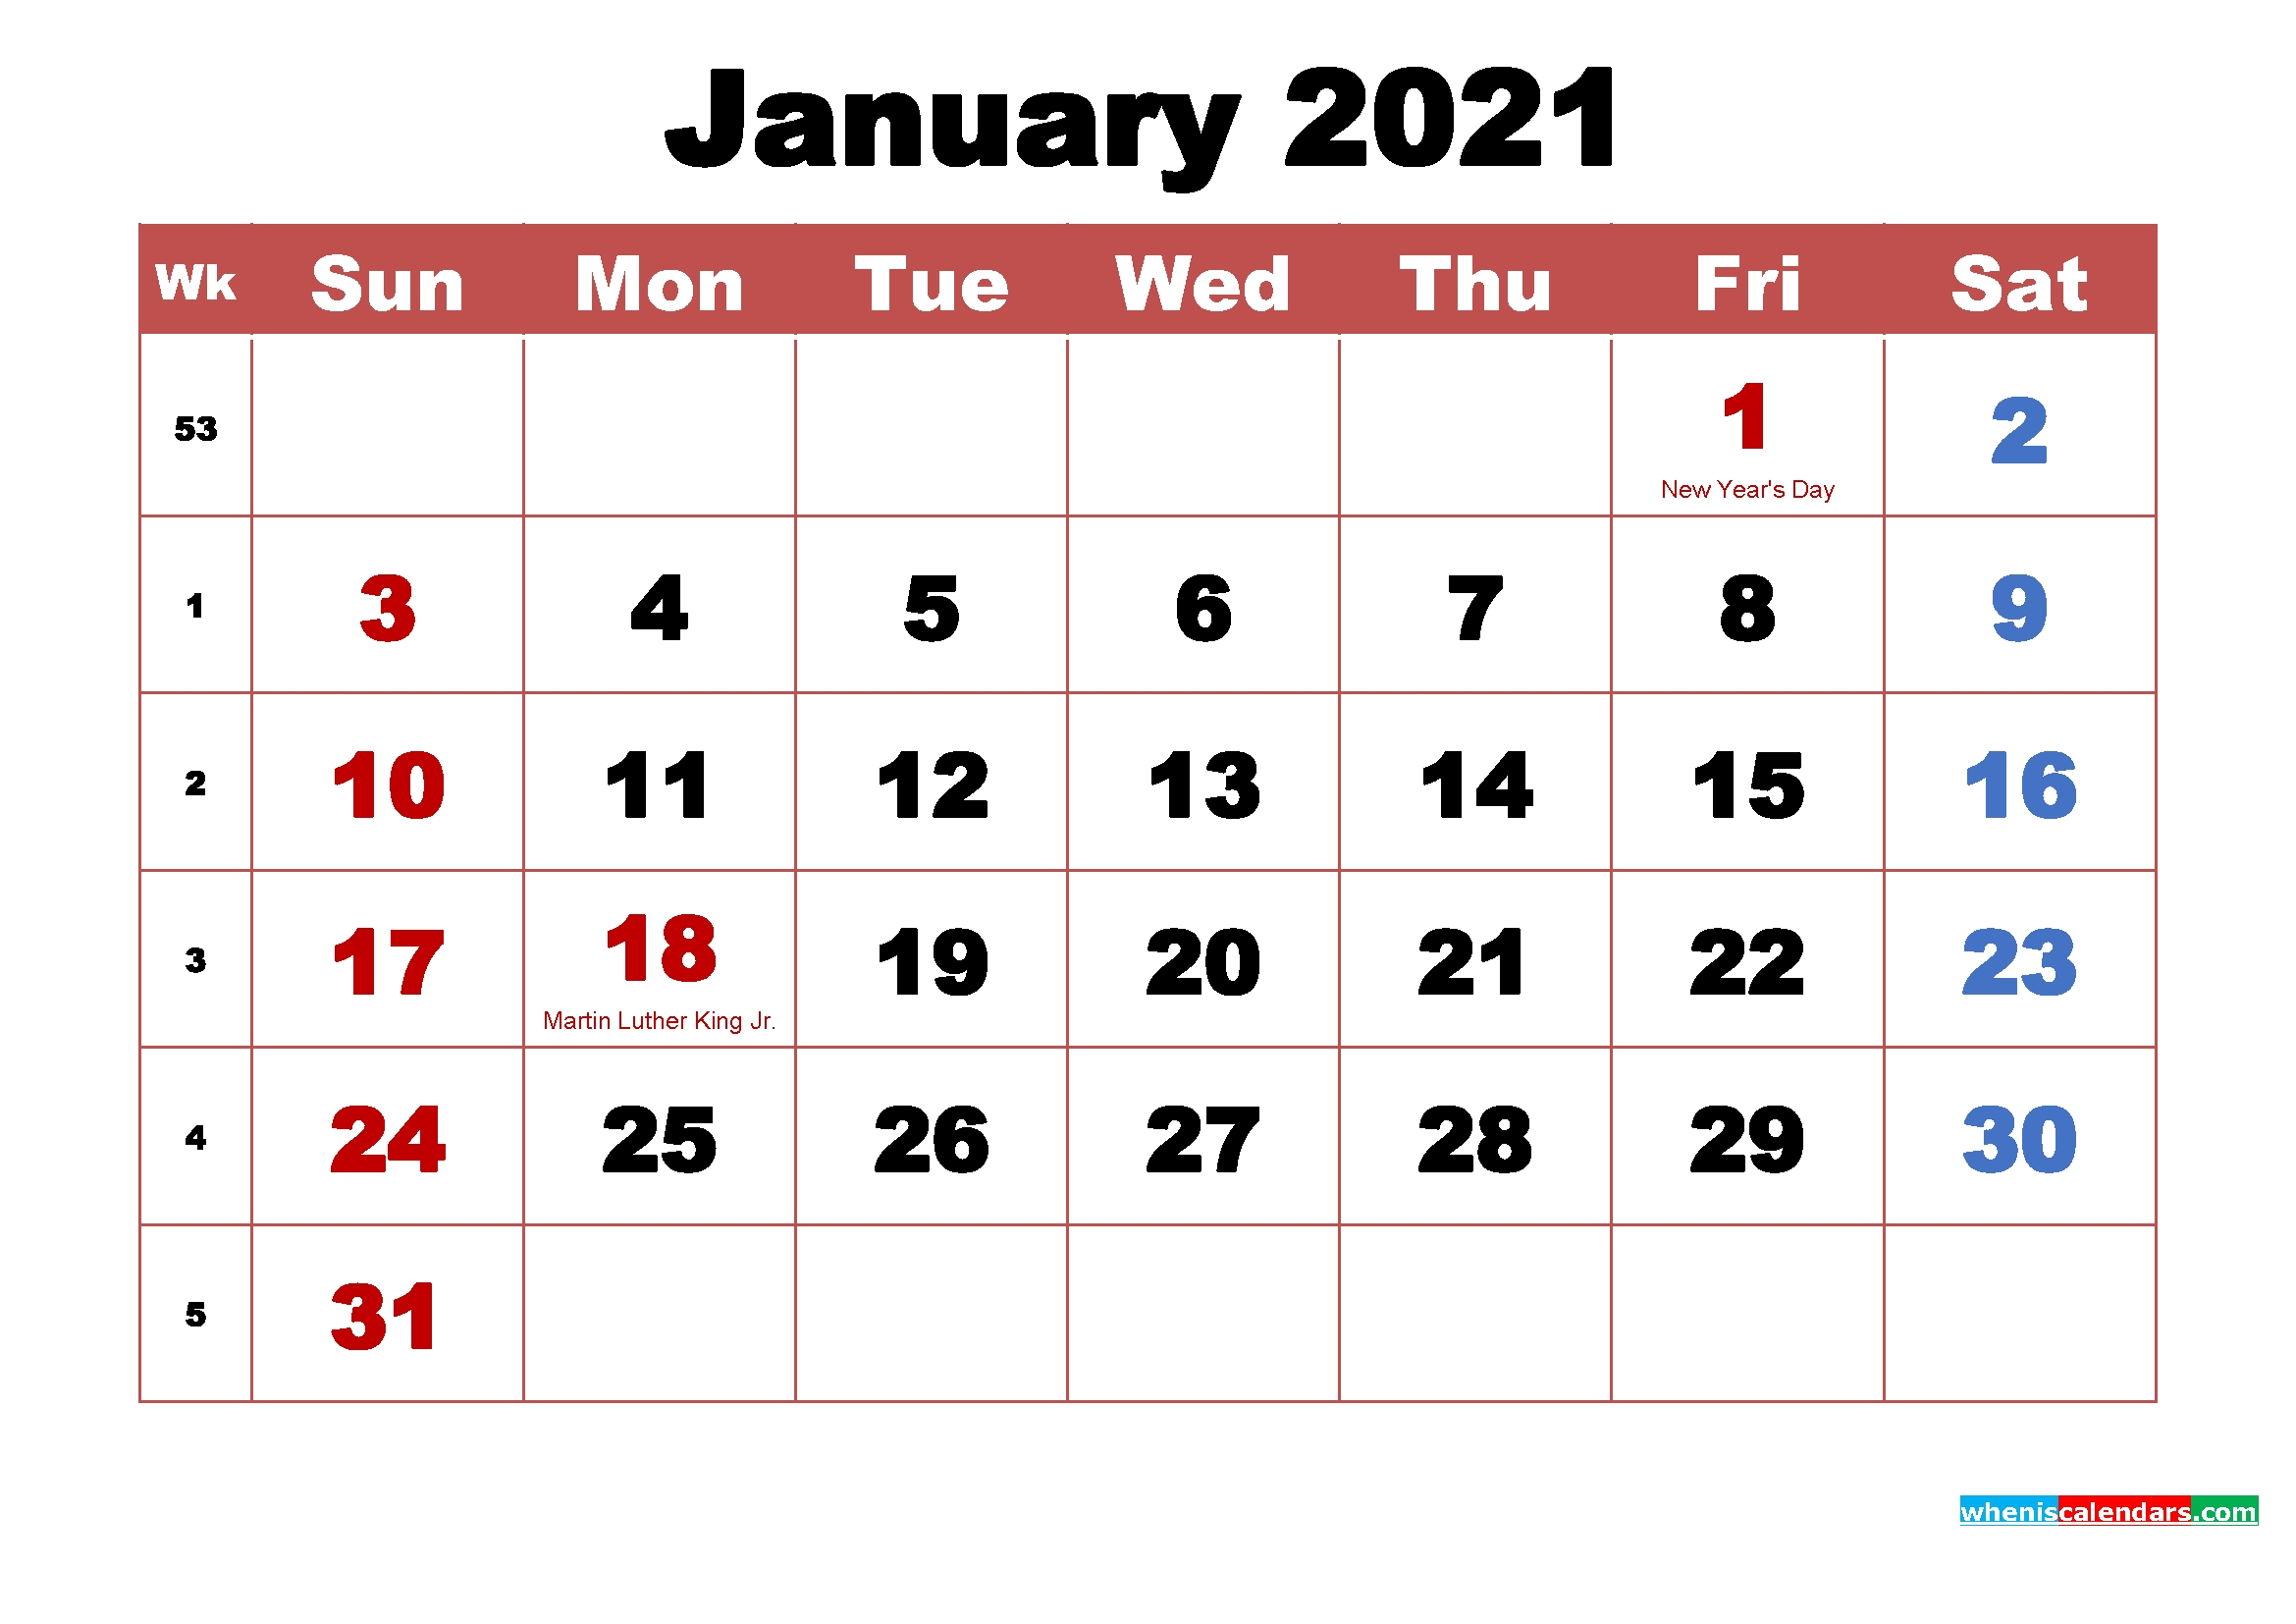 January 2021 Calendar Wallpapers - Top Free January 2021